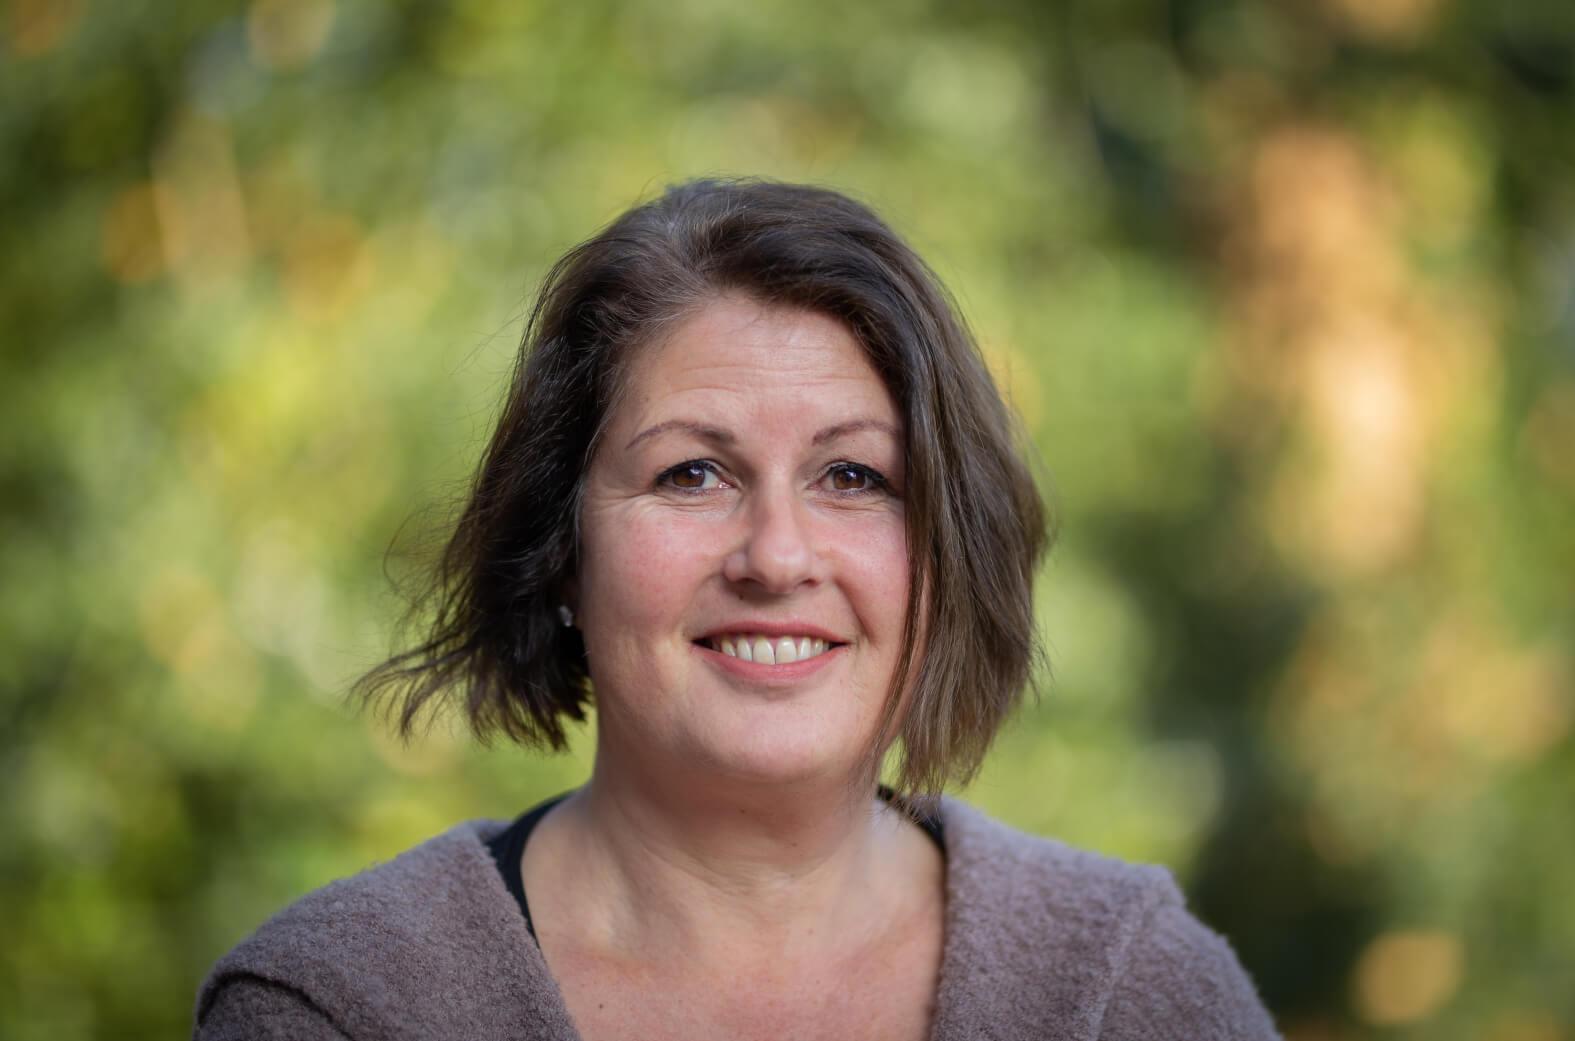 Marianne Linnenbank